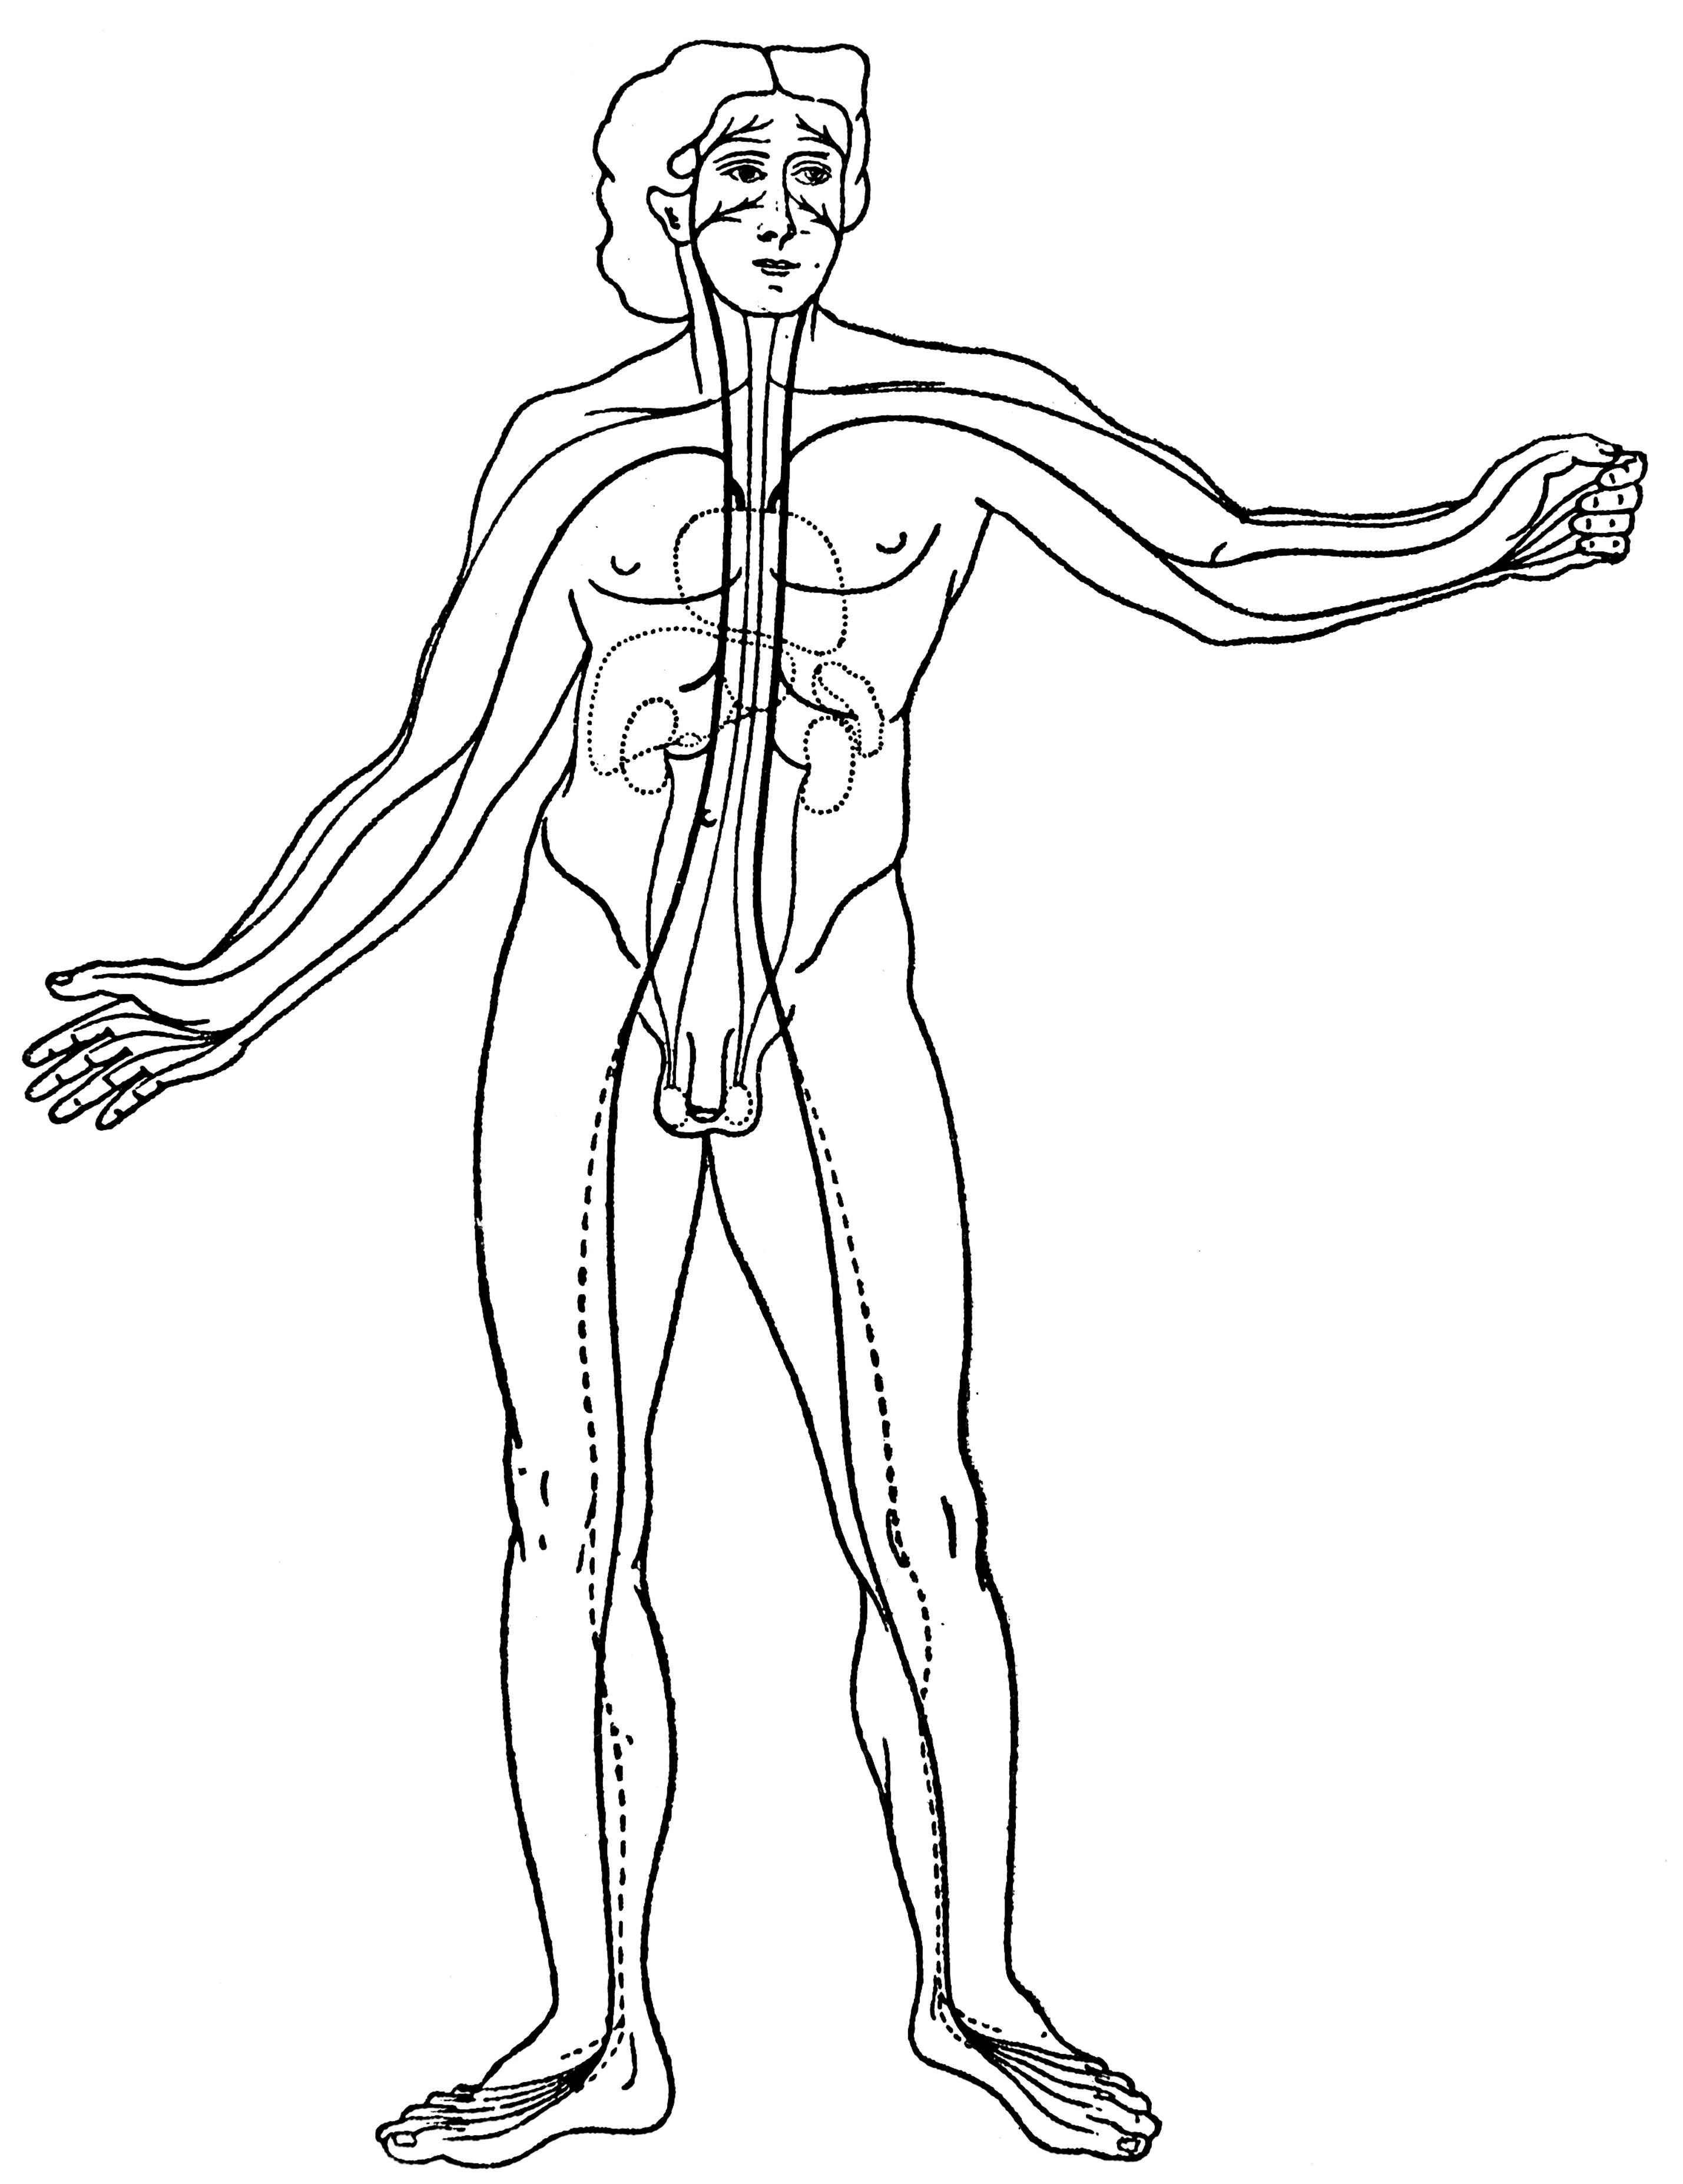 Filethe Vascular System Wellcome M0000374g Wikimedia Commons